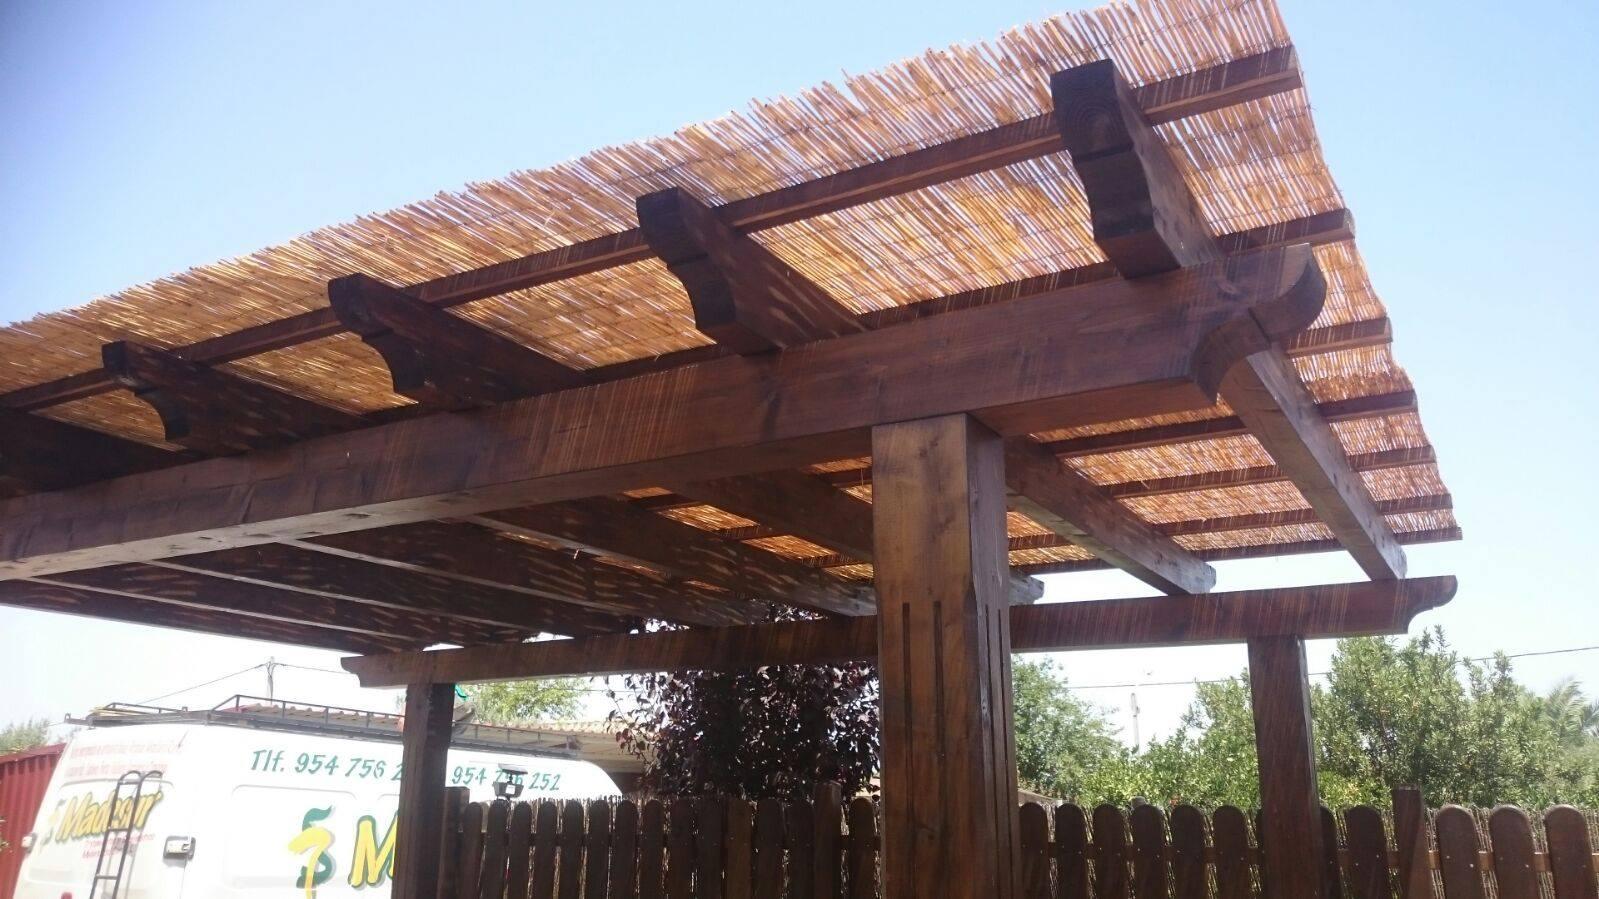 Design pergolas de madera con ca izo galer a de fotos for Tejados de madera y canizo